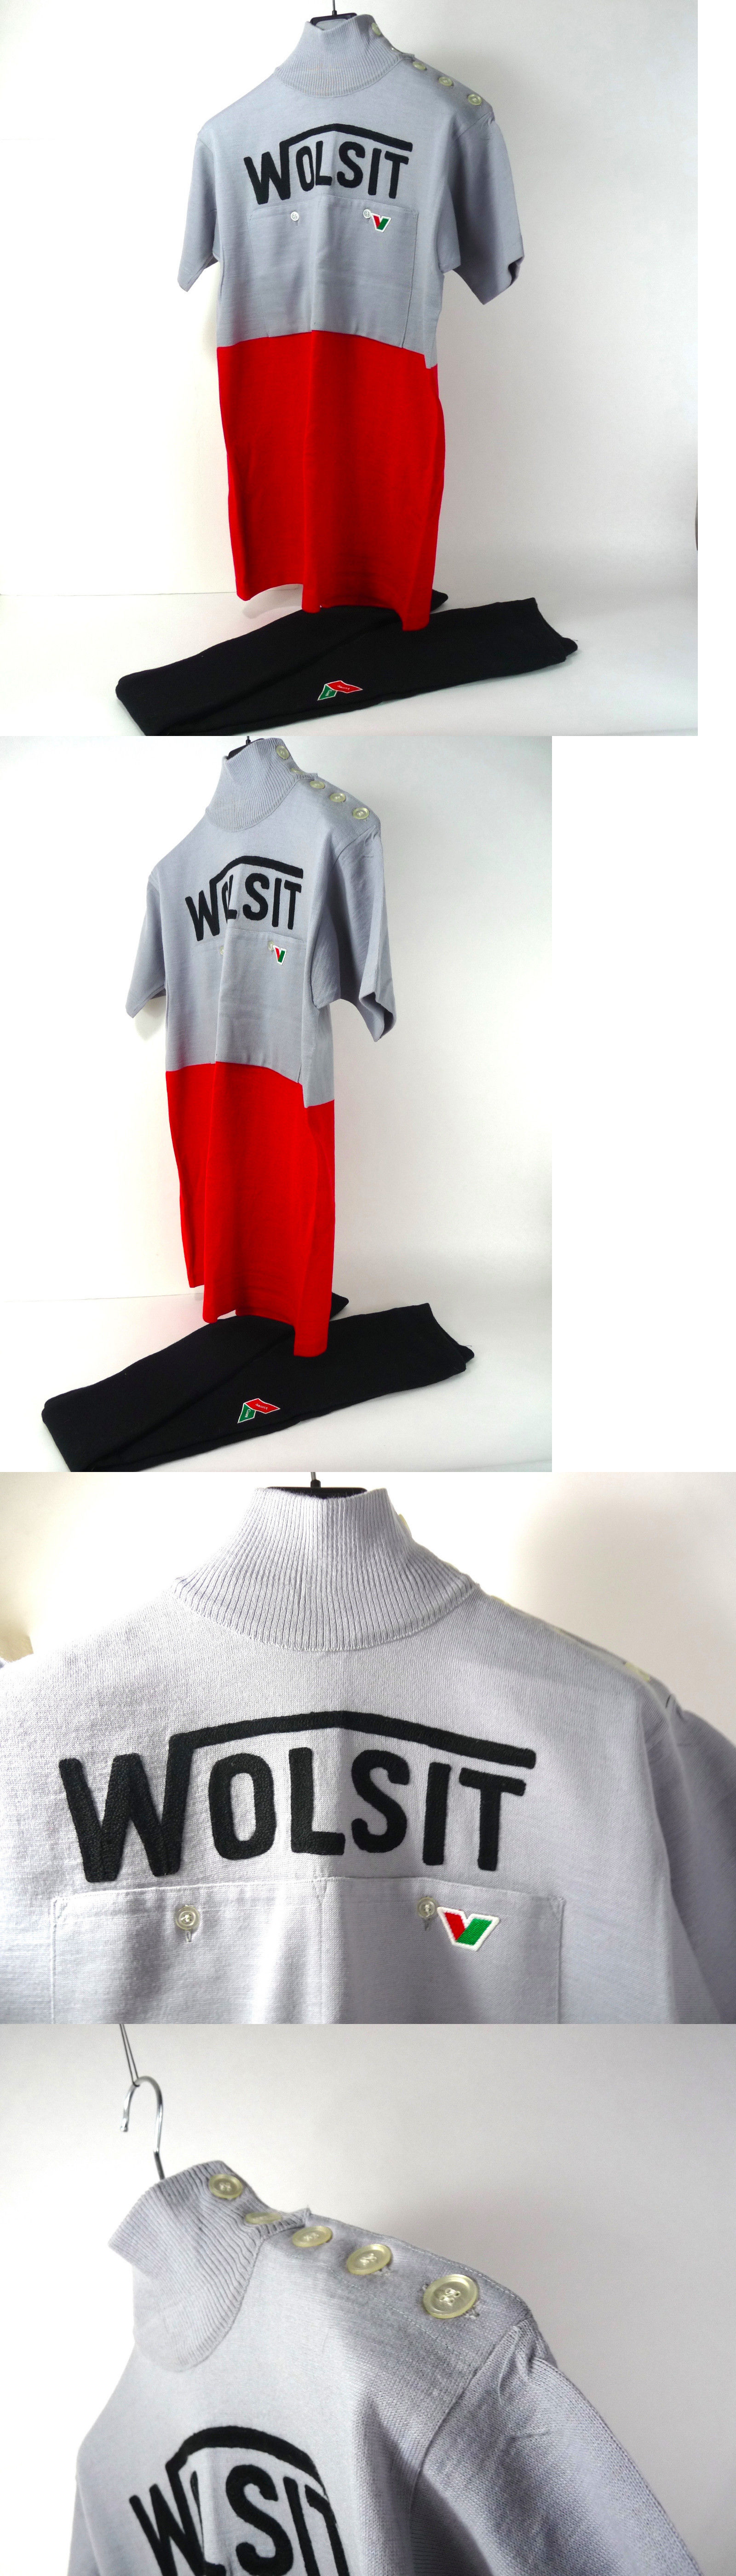 Gloves vittore gianni xl wolsit merino wool jersey l pants